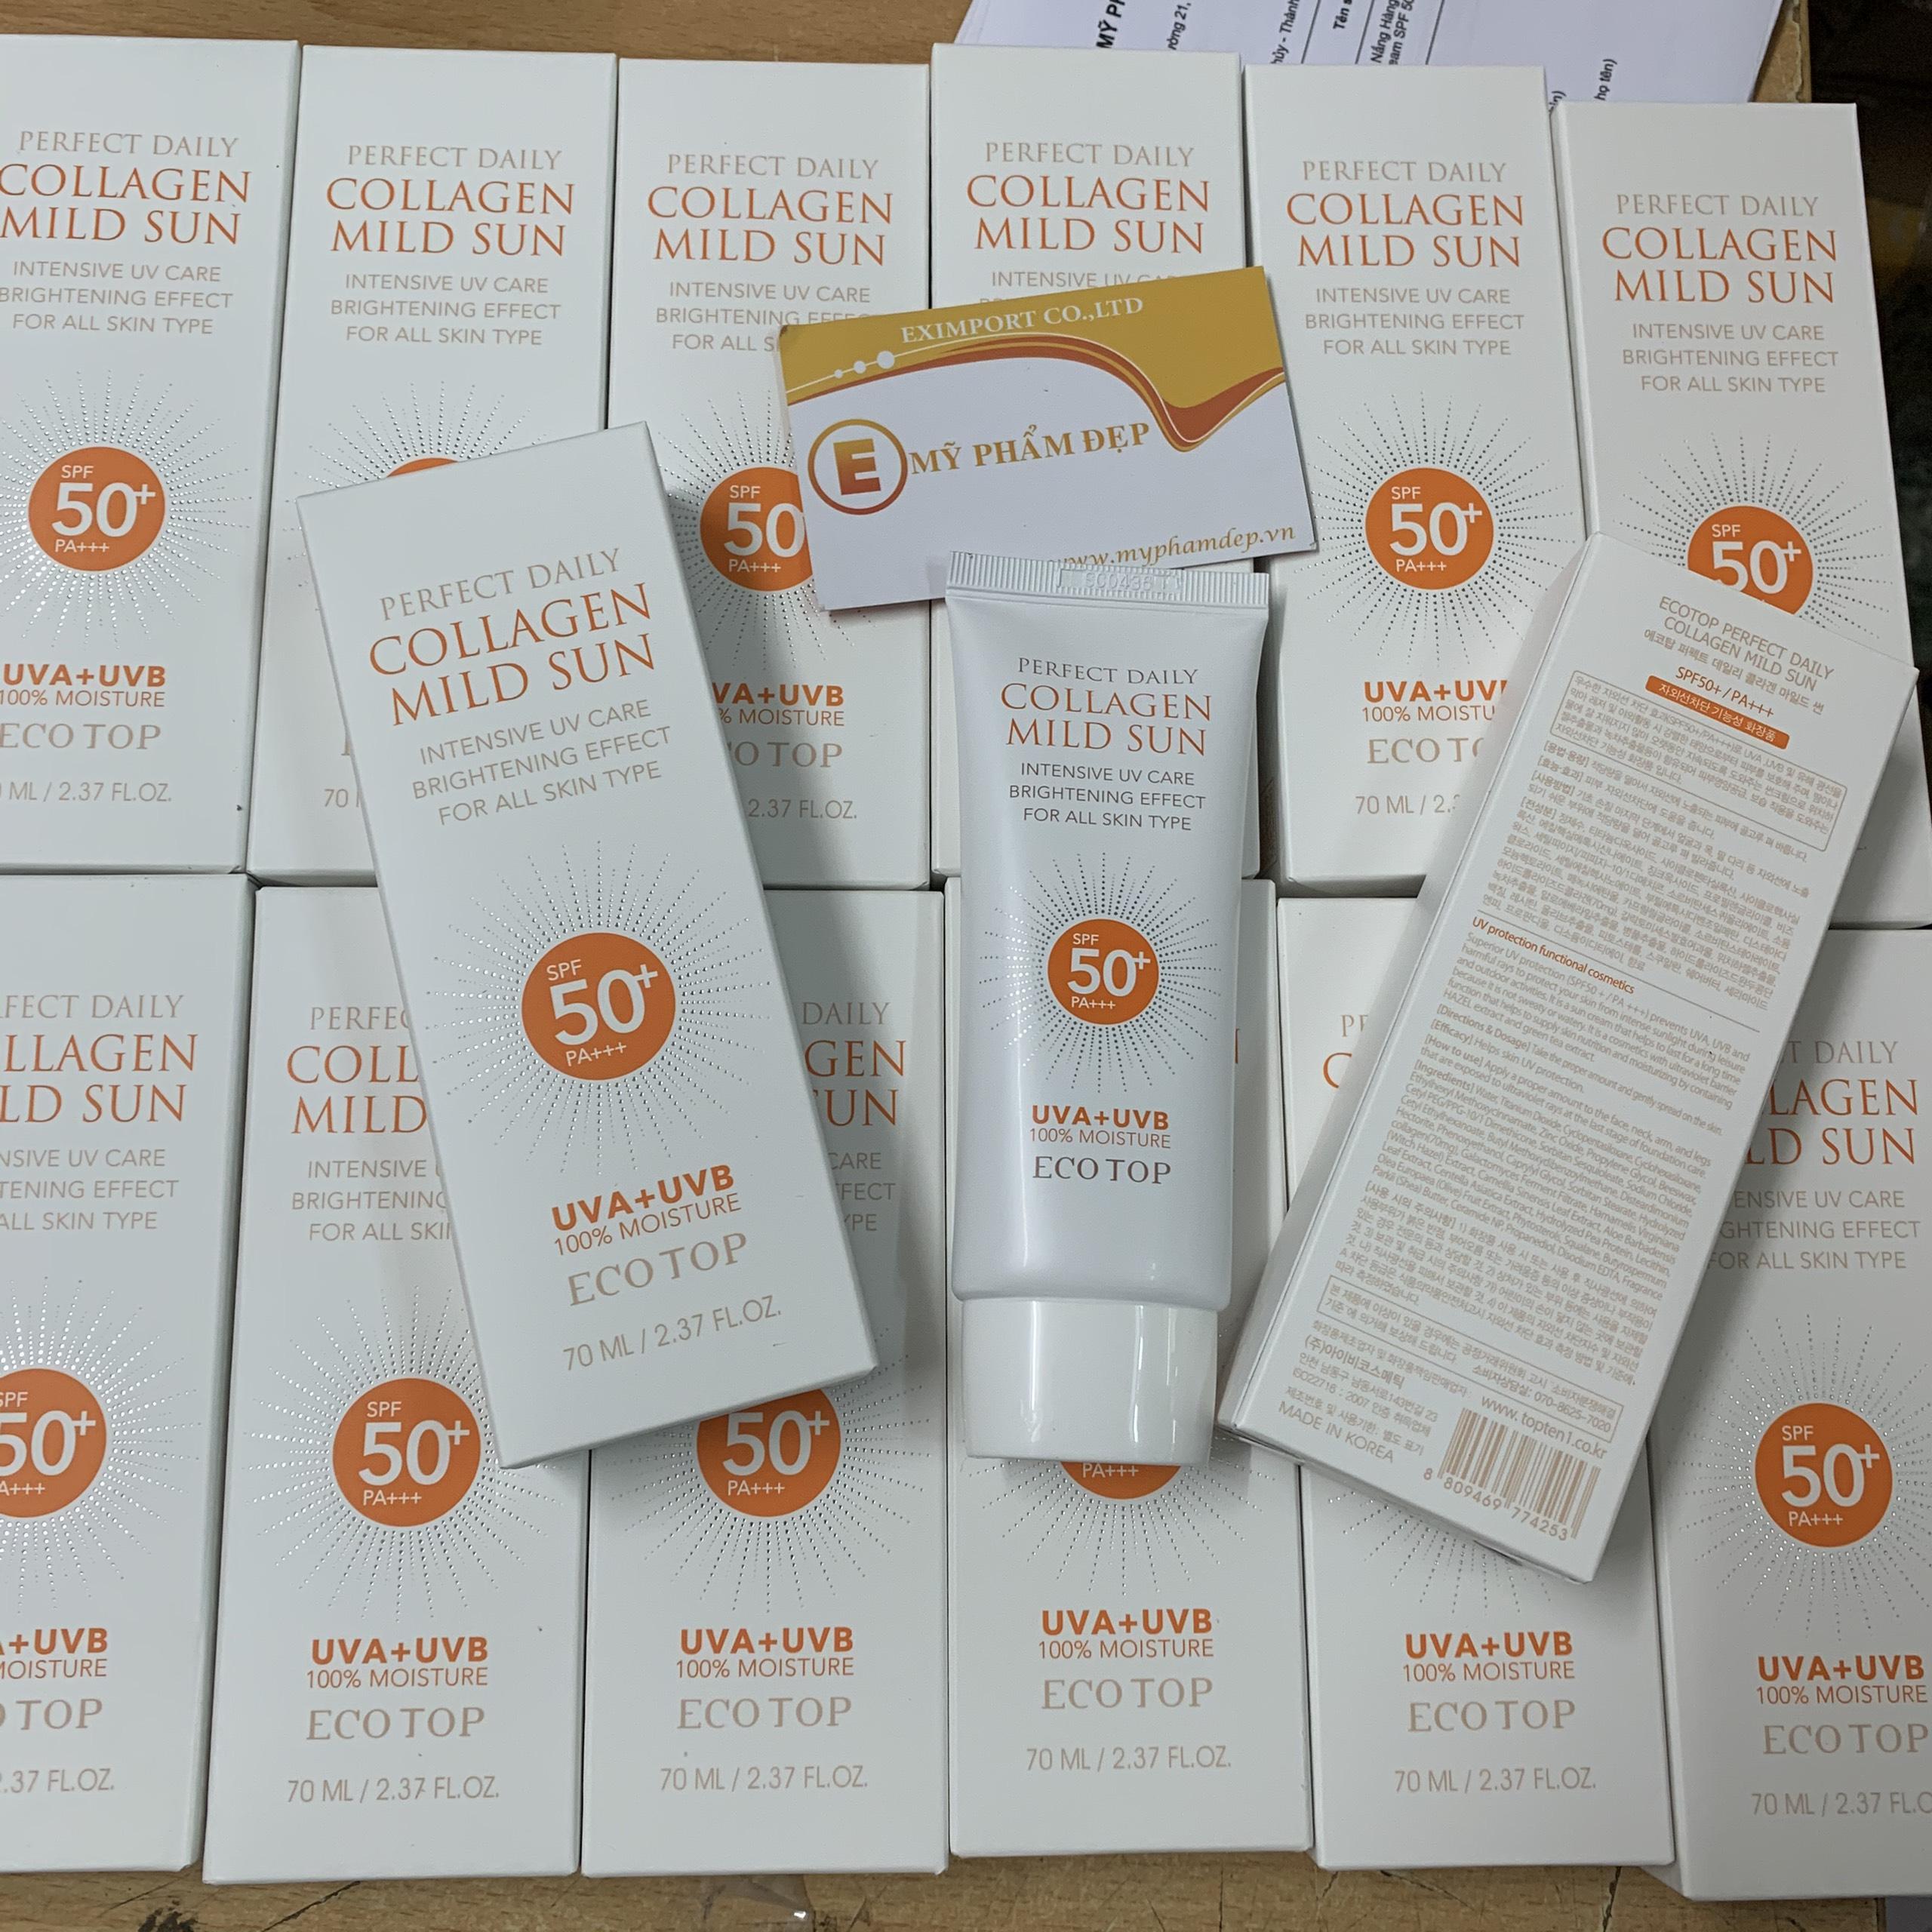 kem-chong-nang-kem-chong-nang-collagen-ecotop-perfect-daily-collagen-mild-sun-spf-50-2661